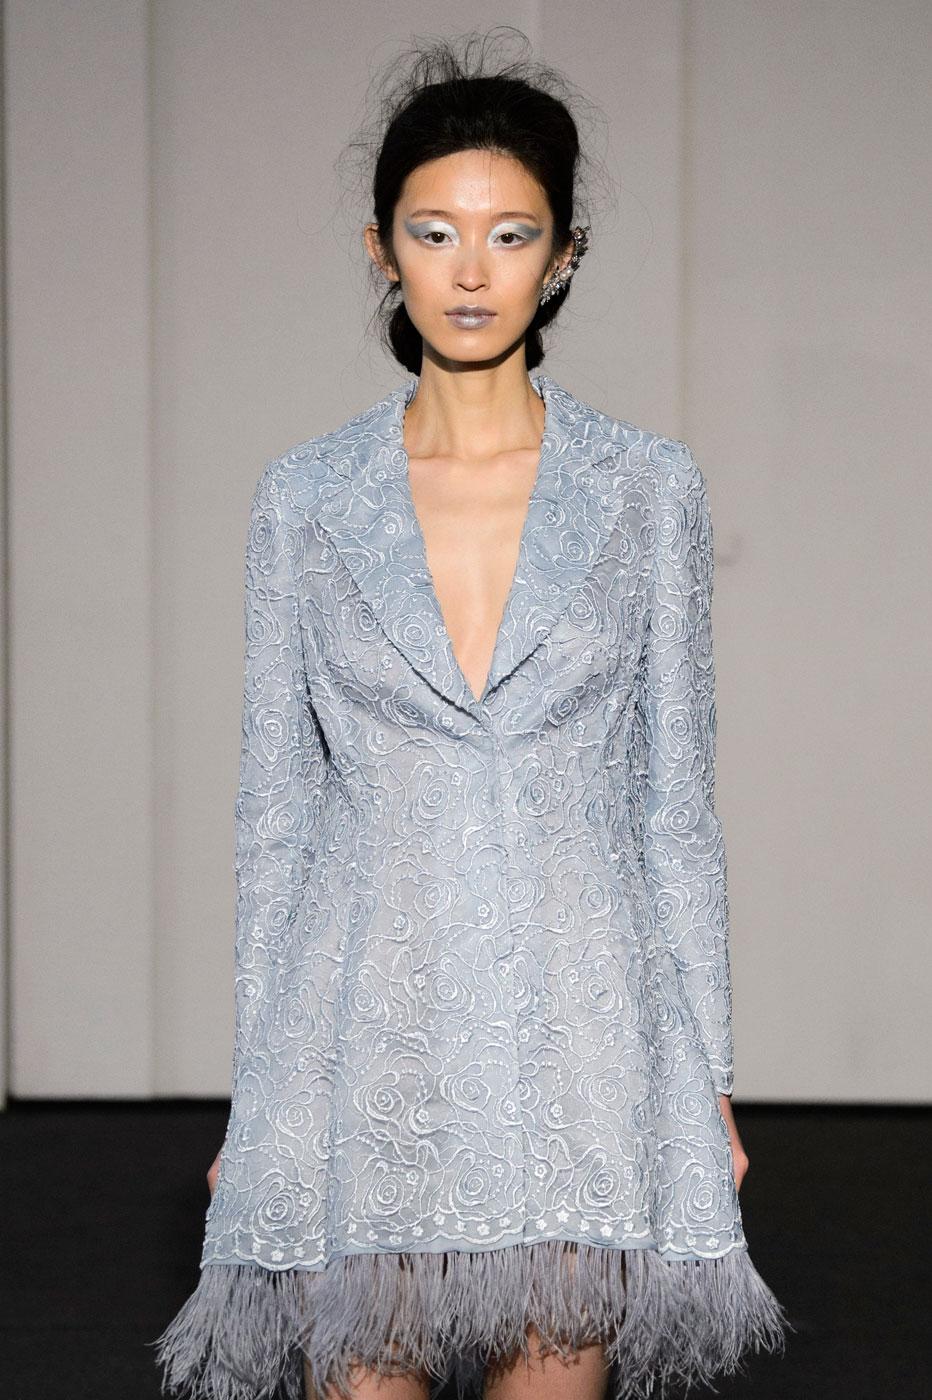 Busardi-fashion-runway-show-haute-couture-paris-spring-2015-the-impression-02